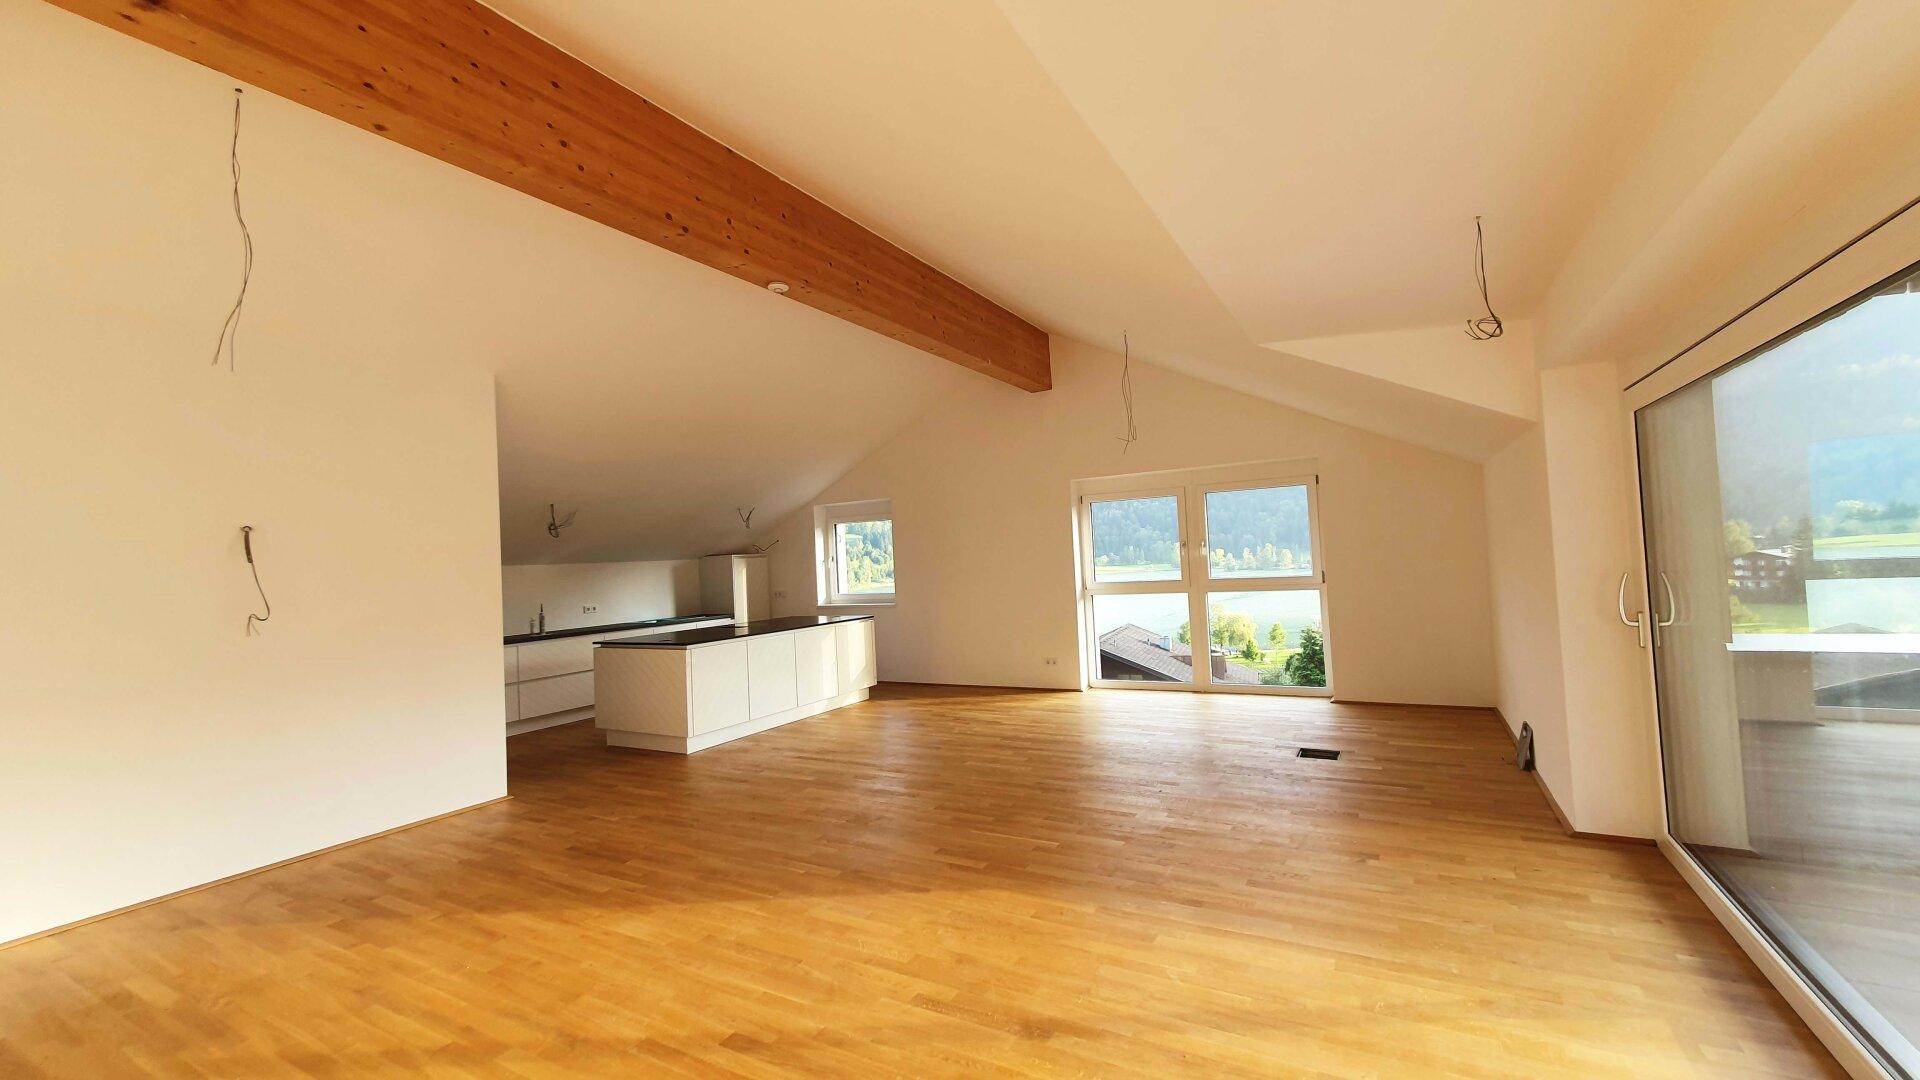 Wohnraum, Wohnung Dachgeschoss Thiersee